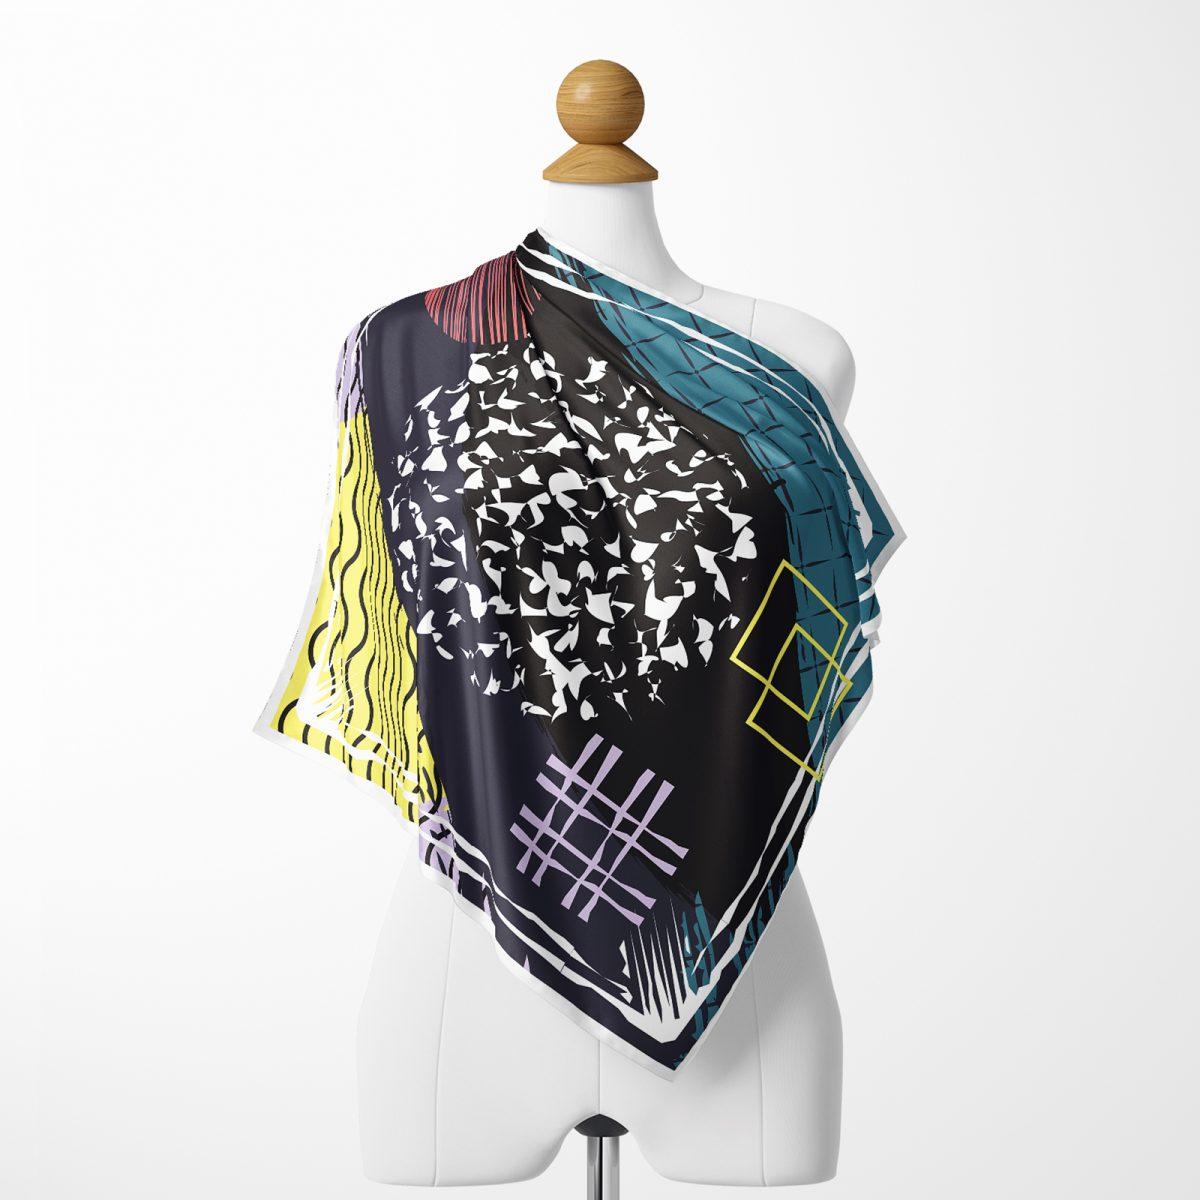 Renkli Modern Puantiyeli Özel Tasarım Tivil Eşarp Realhomes